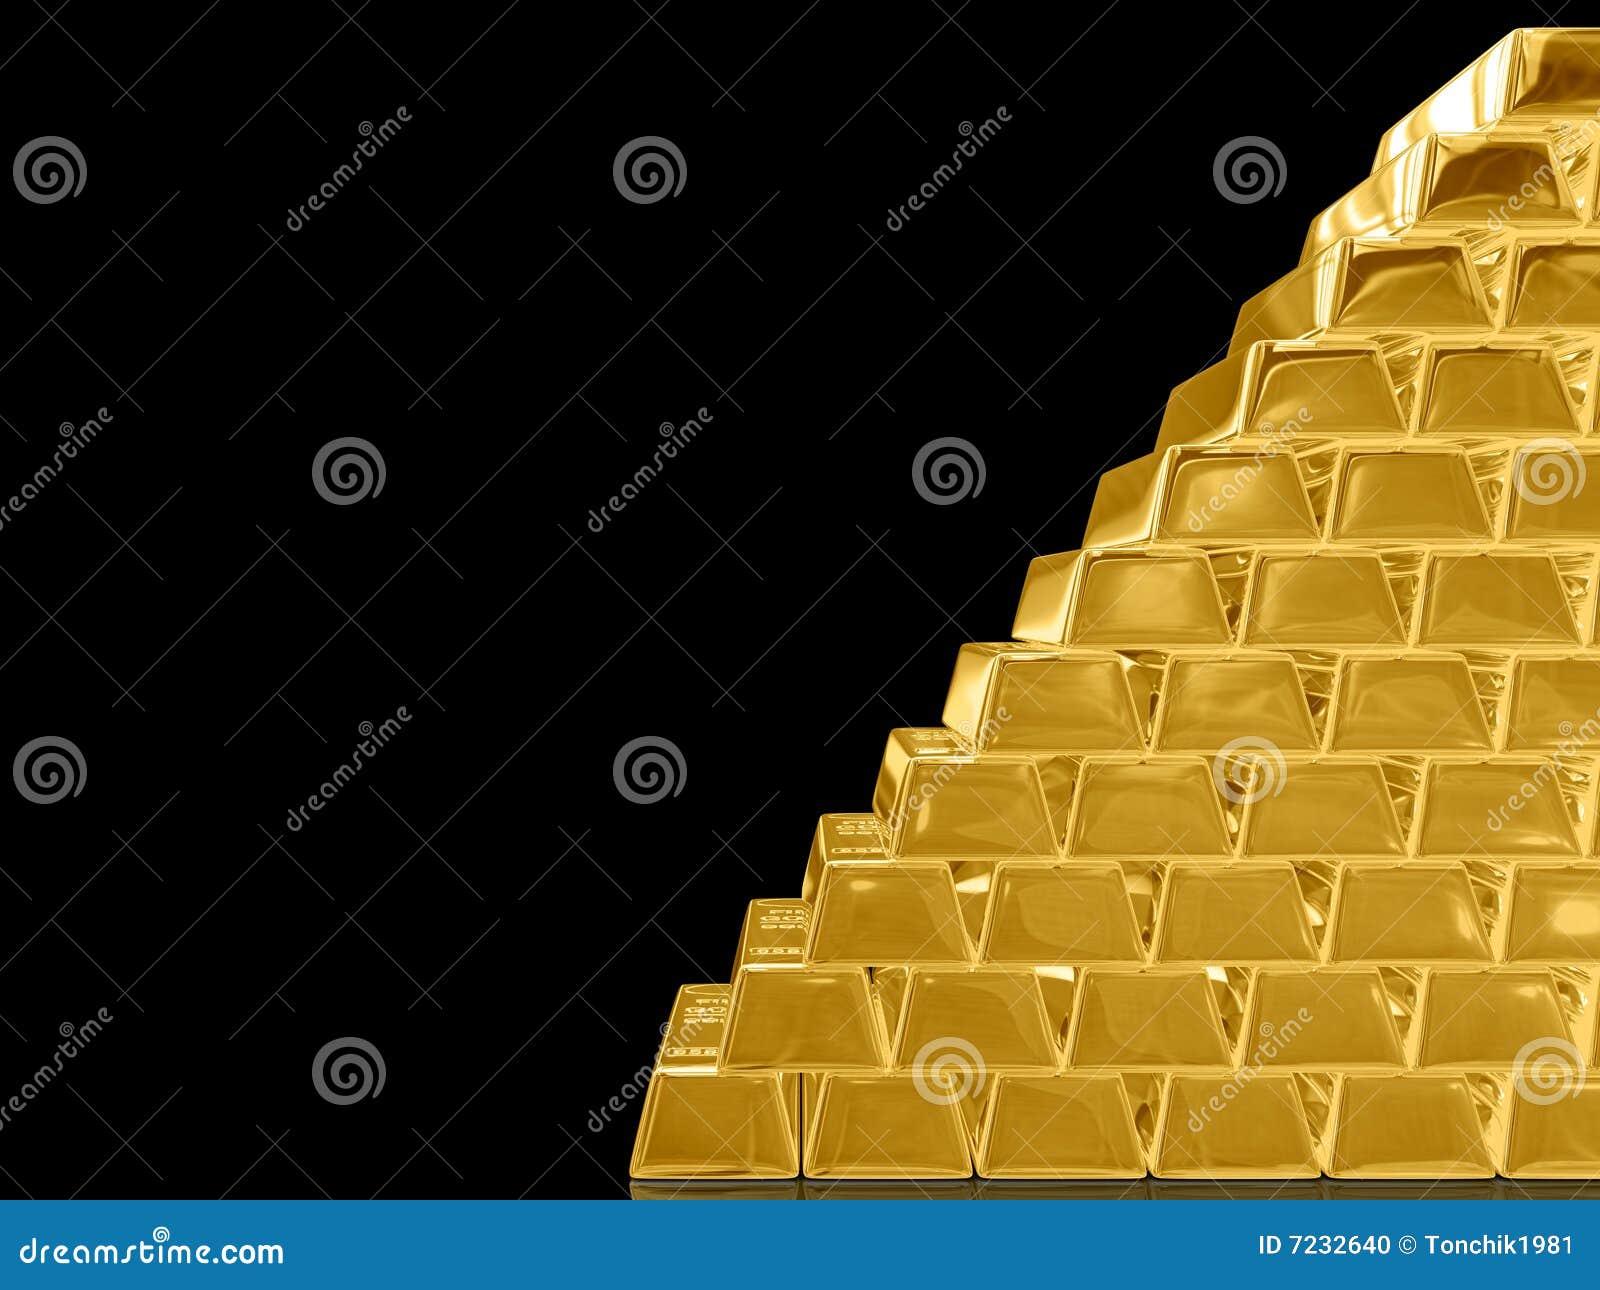 gold bar black background - photo #17